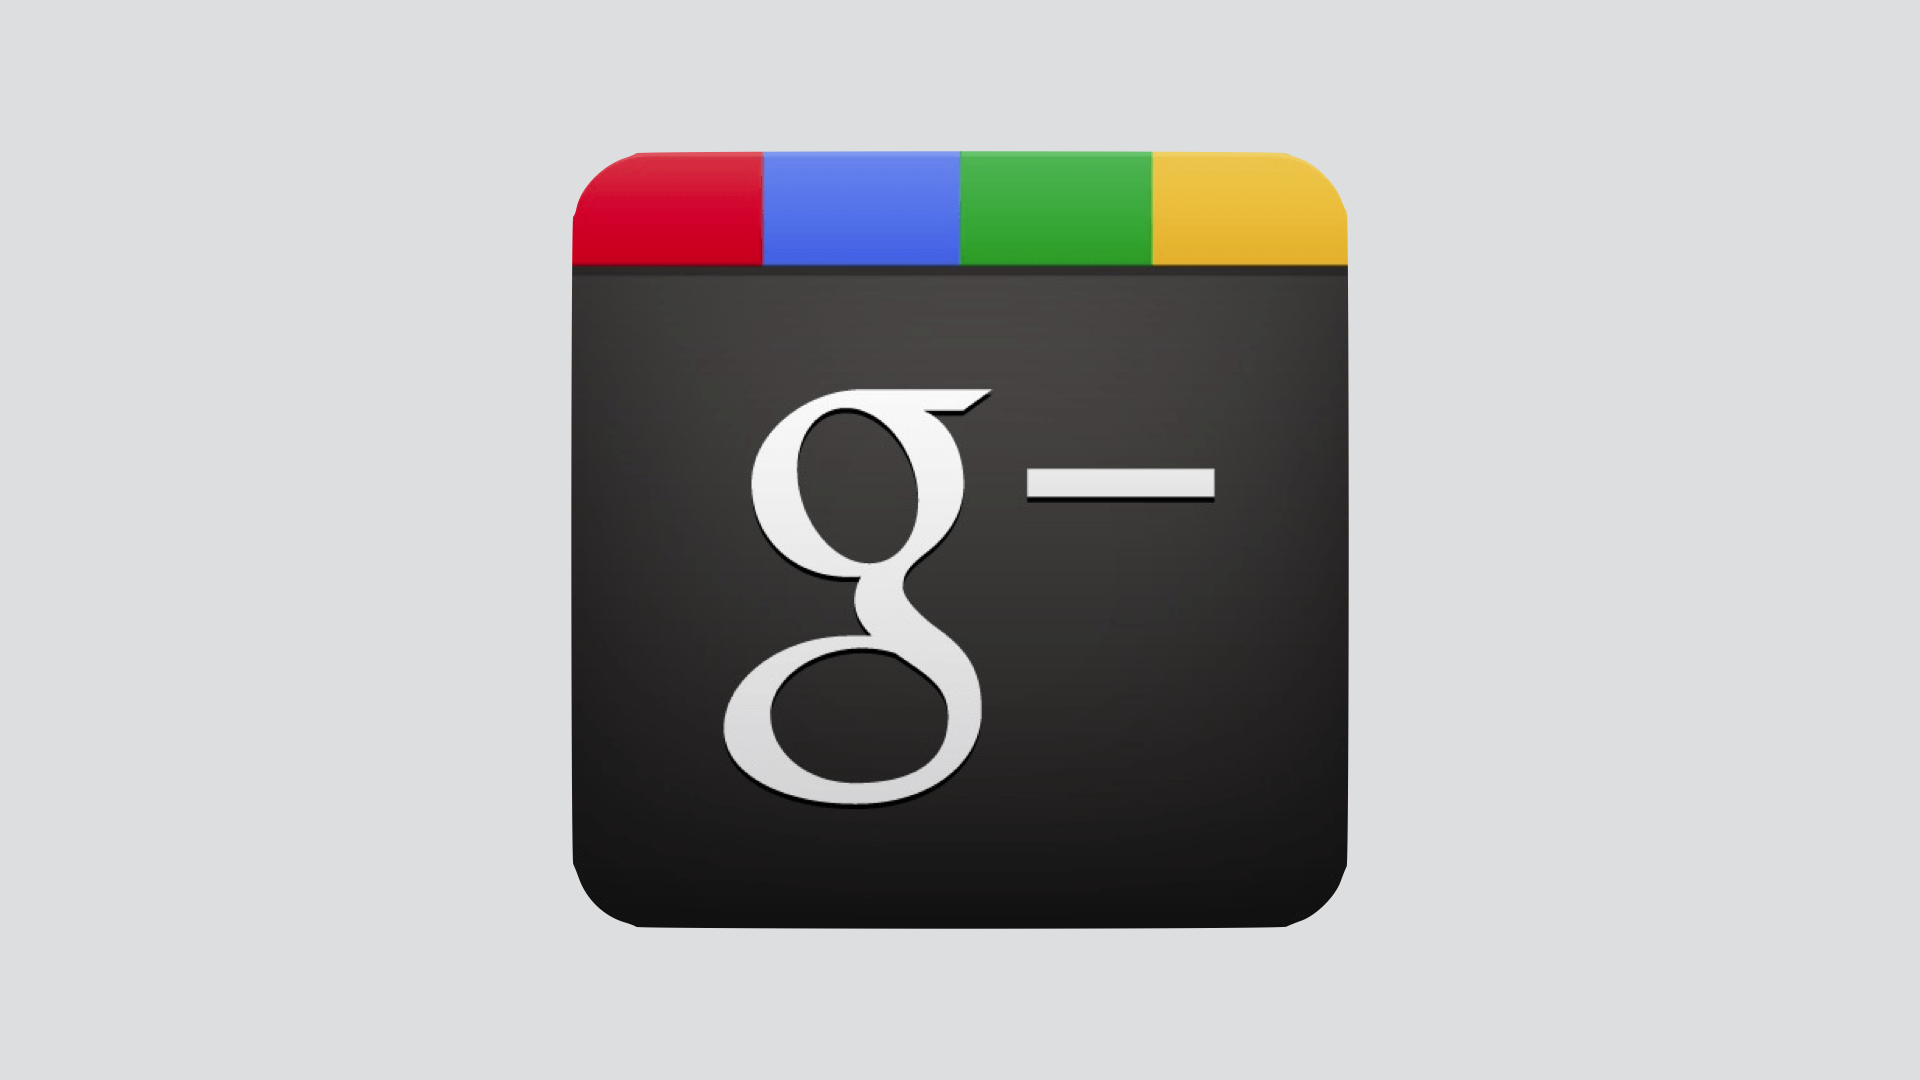 google_minus.001.png